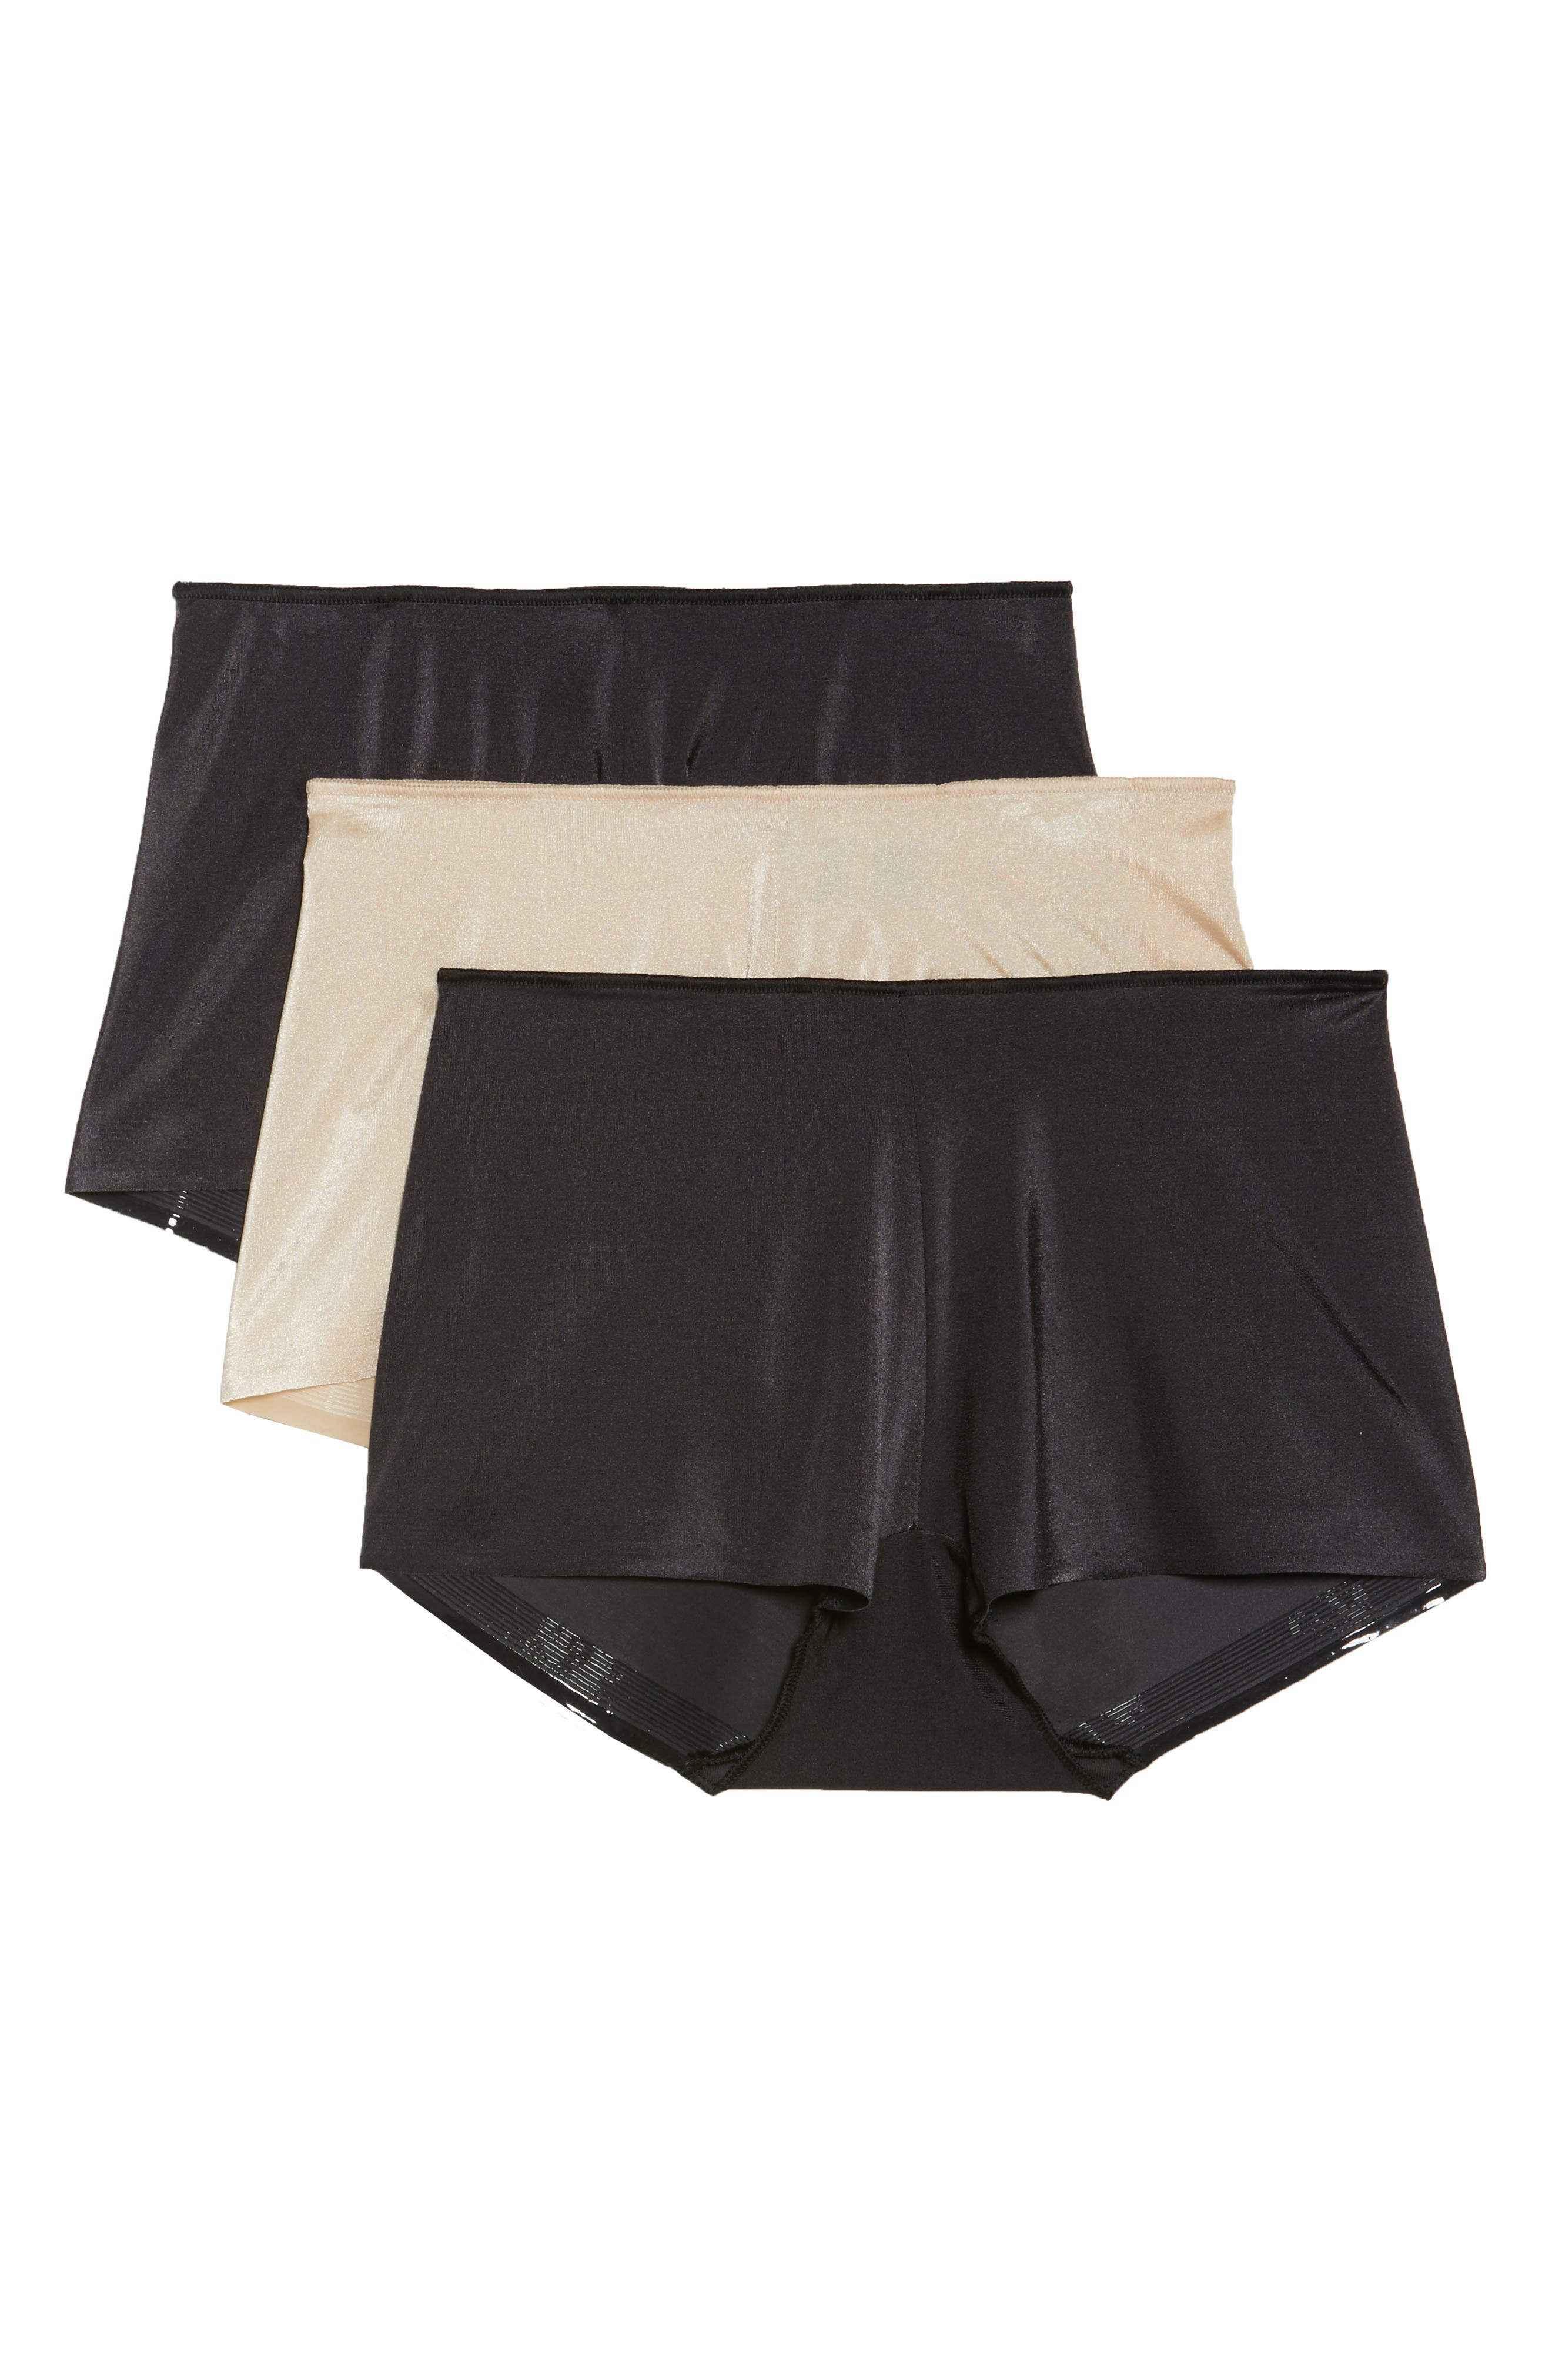 3-Pack High Waist Boyshorts,                             Main thumbnail 1, color,                             BLACK/ NUDE